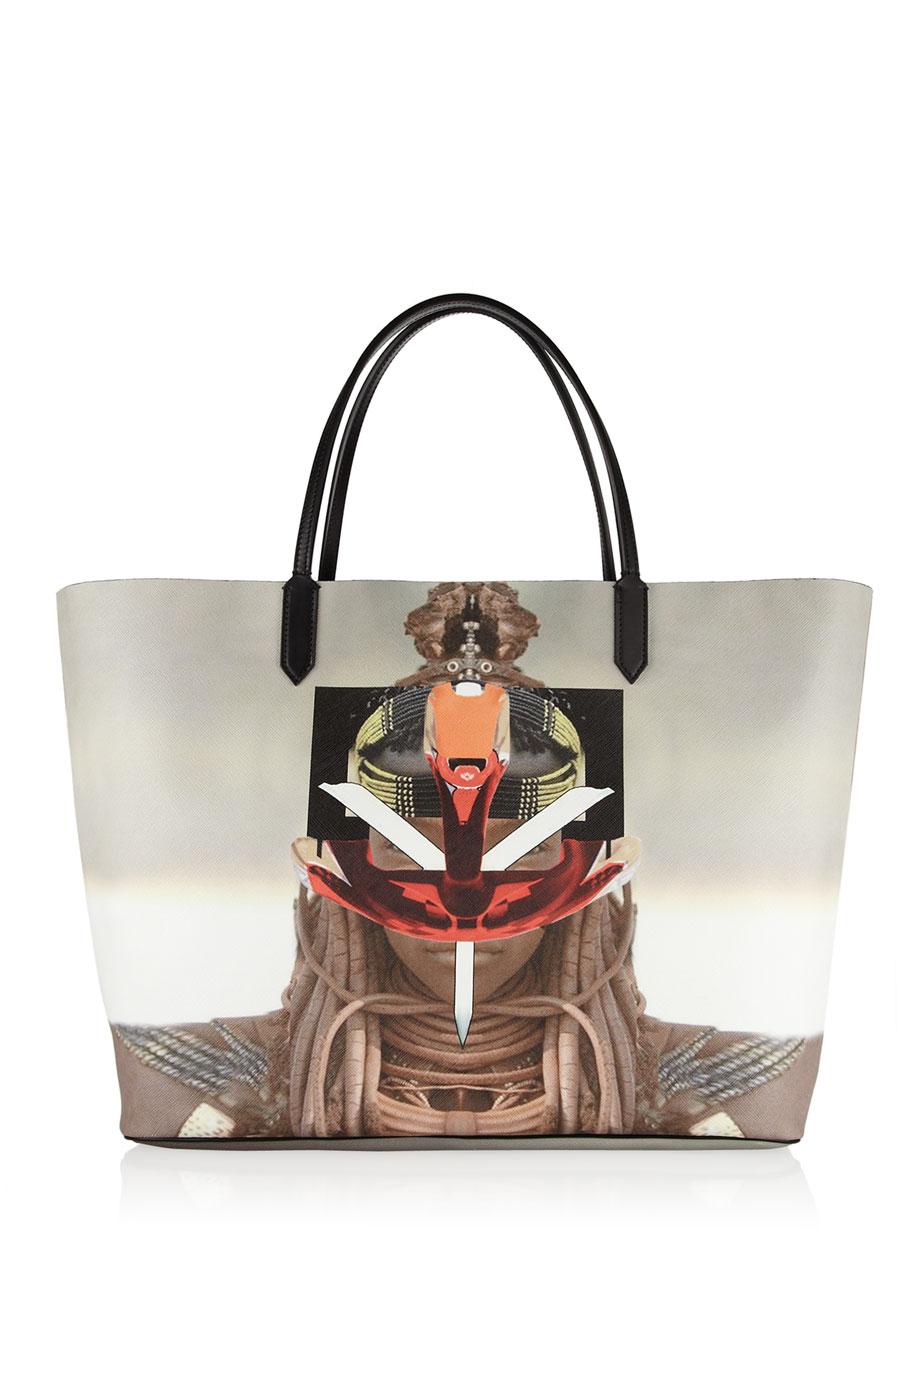 ff7a9d13e84e Lyst - Givenchy Antigona Shopping Bag in Printed Coated Canvas in Black